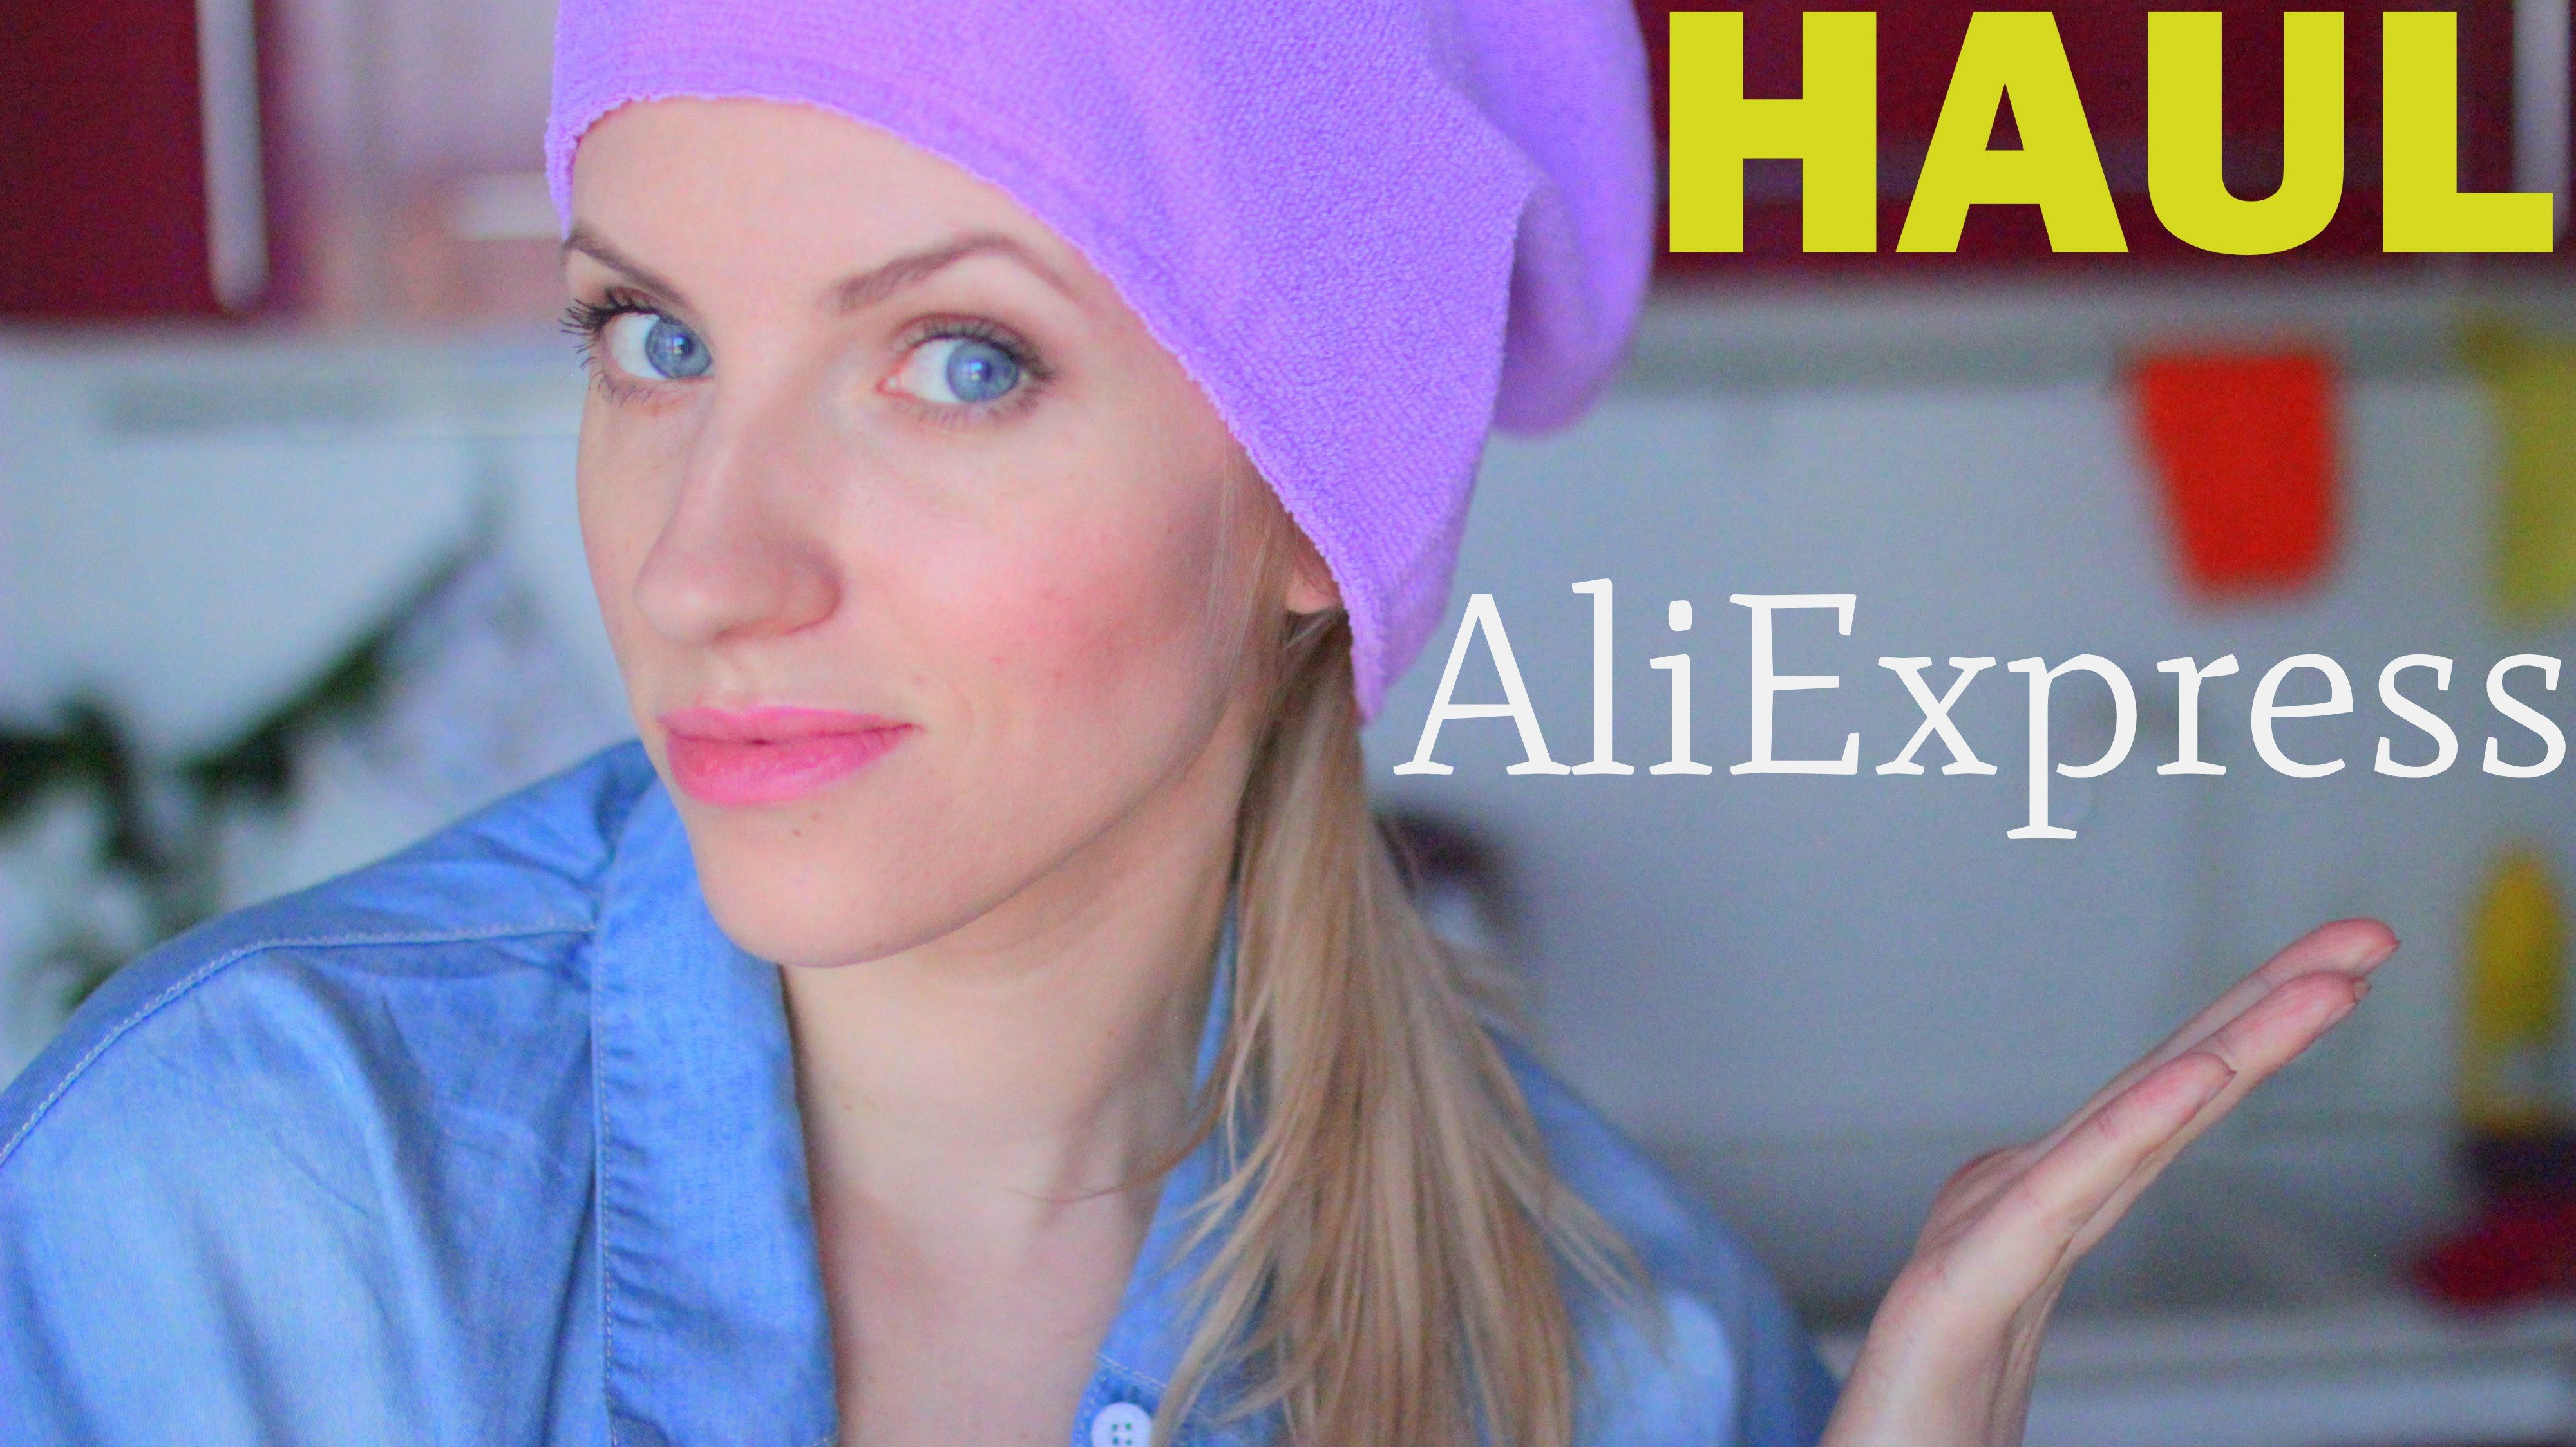 Link  http://su0.ru/G6y0    My YouTube http://su0.ru/P64O Alliexpress http://su0.ru/QW3t Letyshops  http://su0.ru/ZvnA